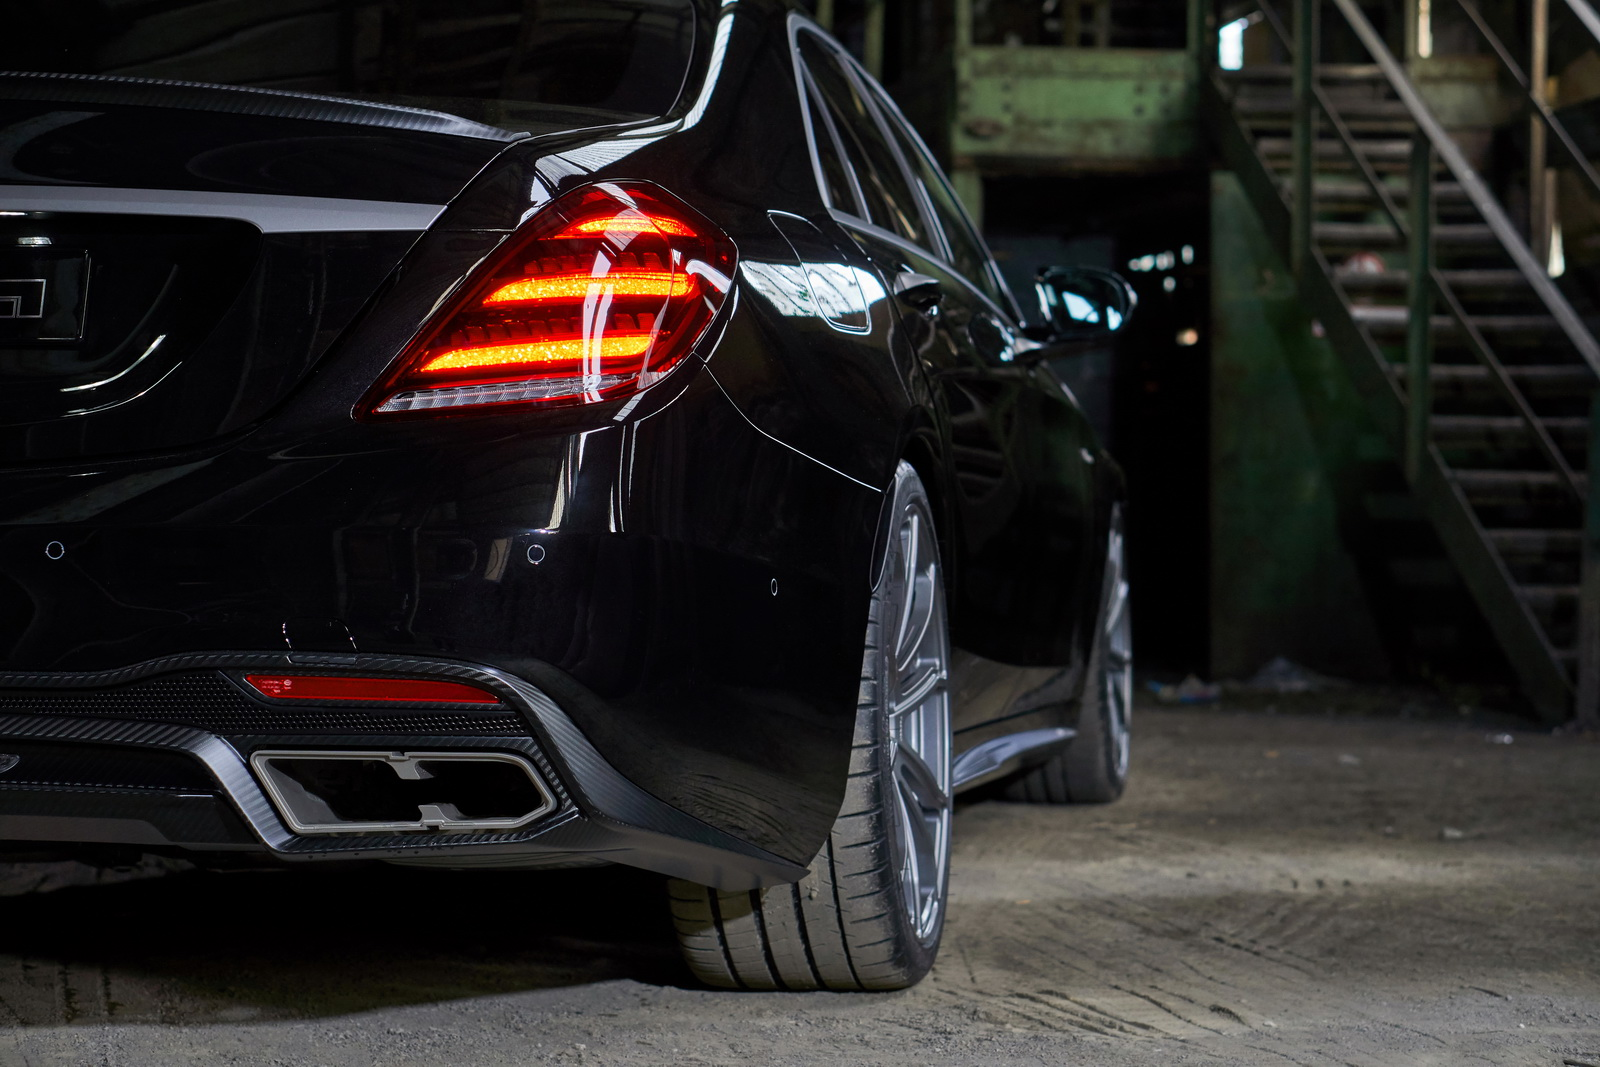 720 CV en tu Mercedes-AMG S63 gracias a IMSA